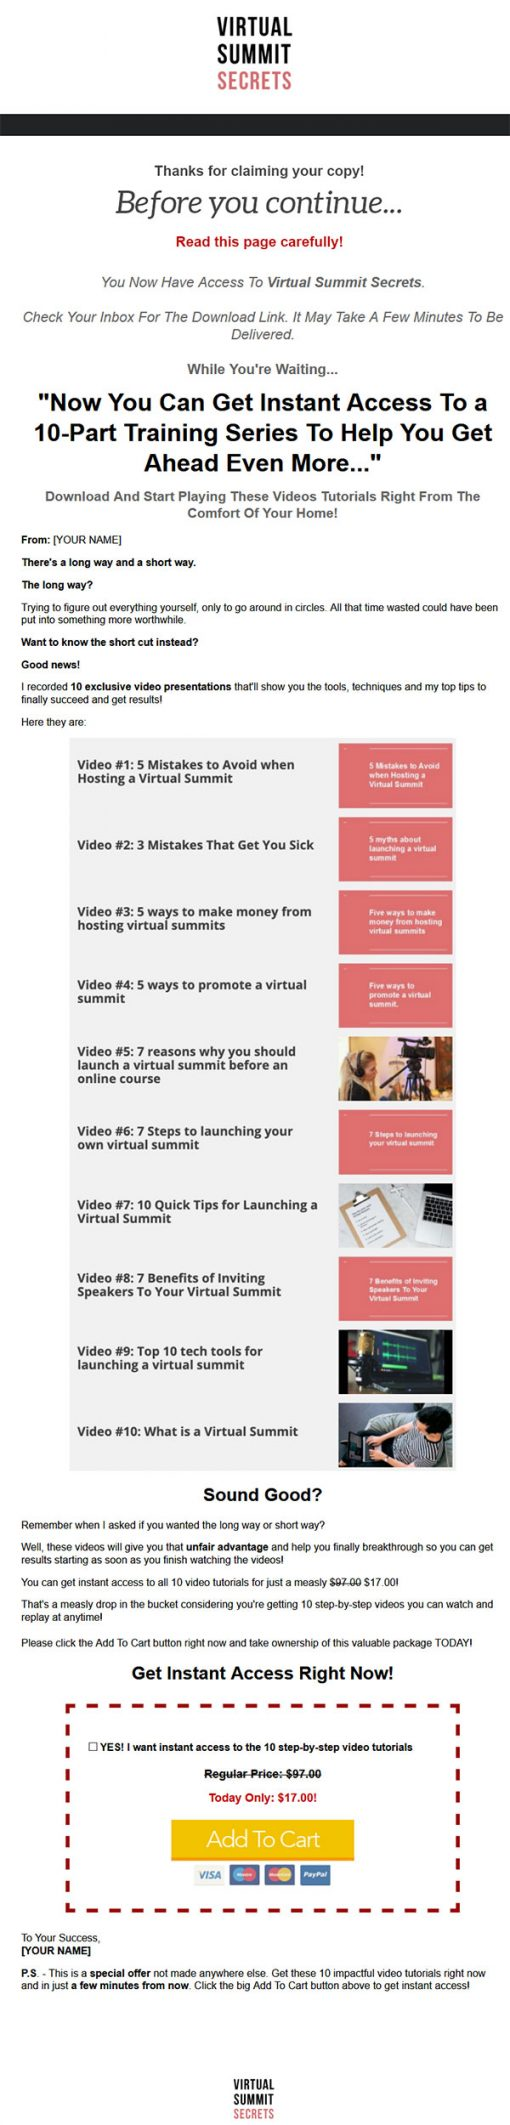 Virtual Summit Secrets Ebook and Videos MRR